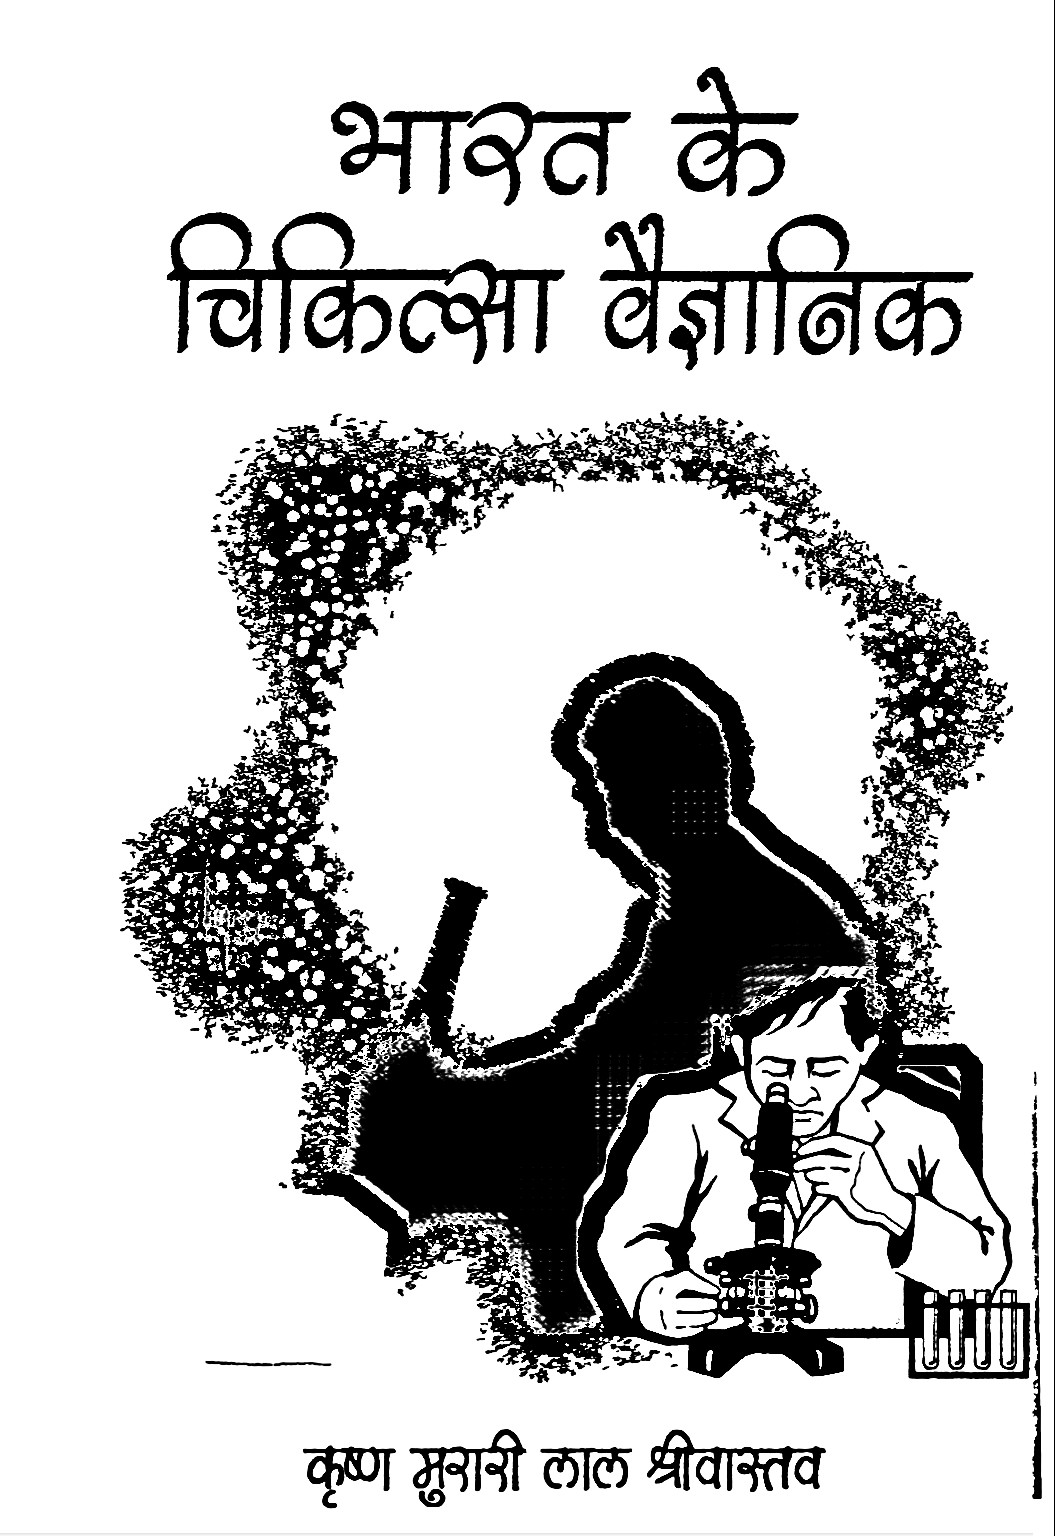 भारत के चिकित्सा वैज्ञानिक पुस्तक पीडीएफ | Bharat ke Chikitsa Vaigyanik Hindi Book PDF